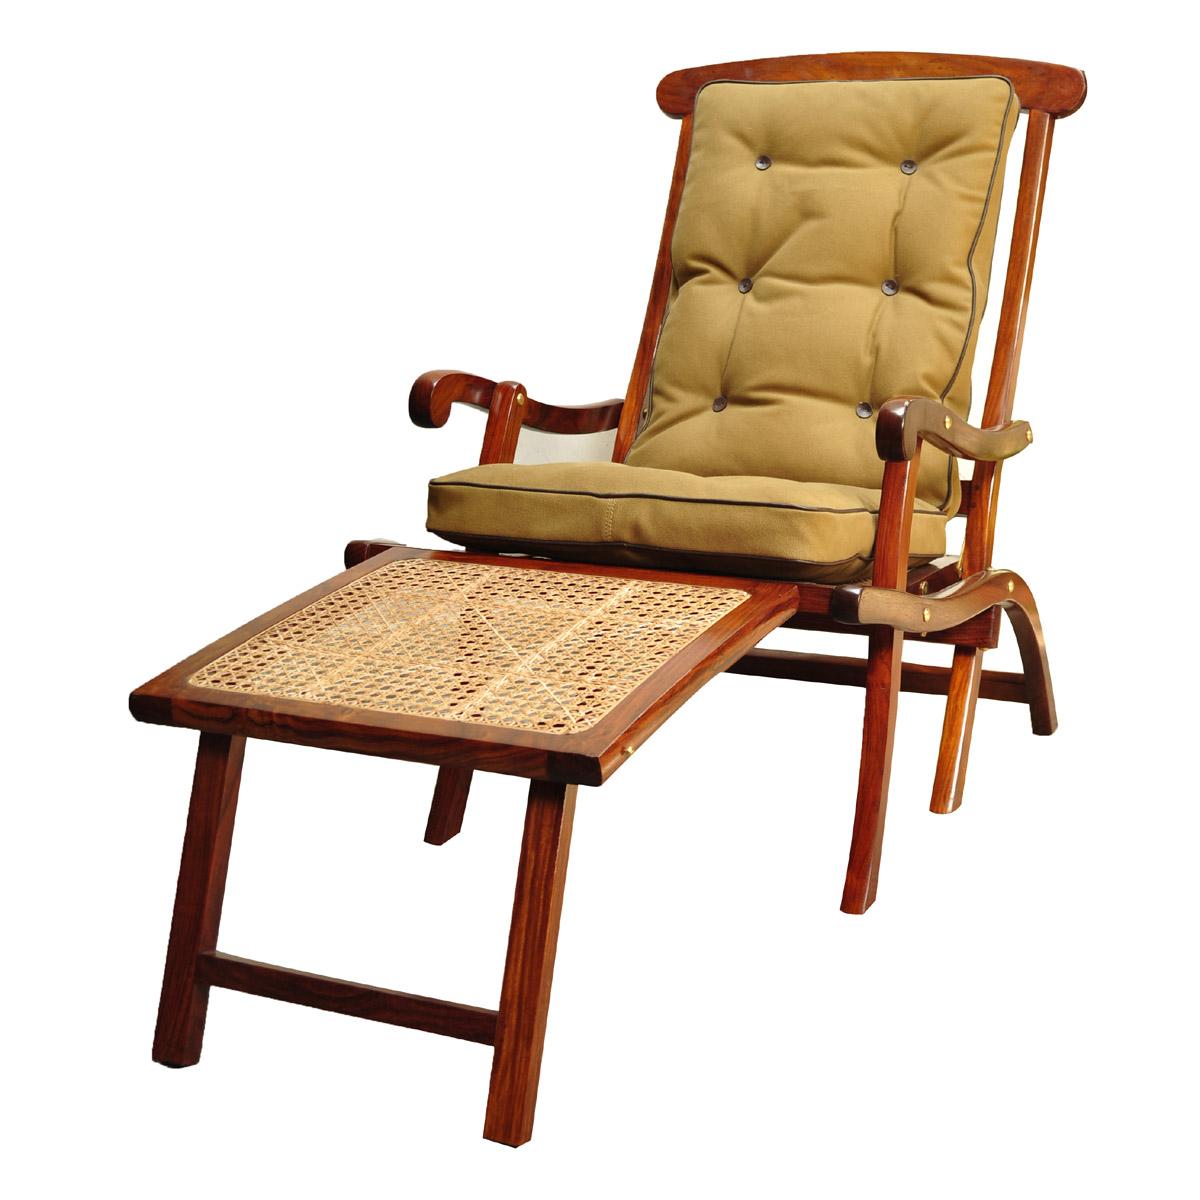 titanic deck chair | j and r guram